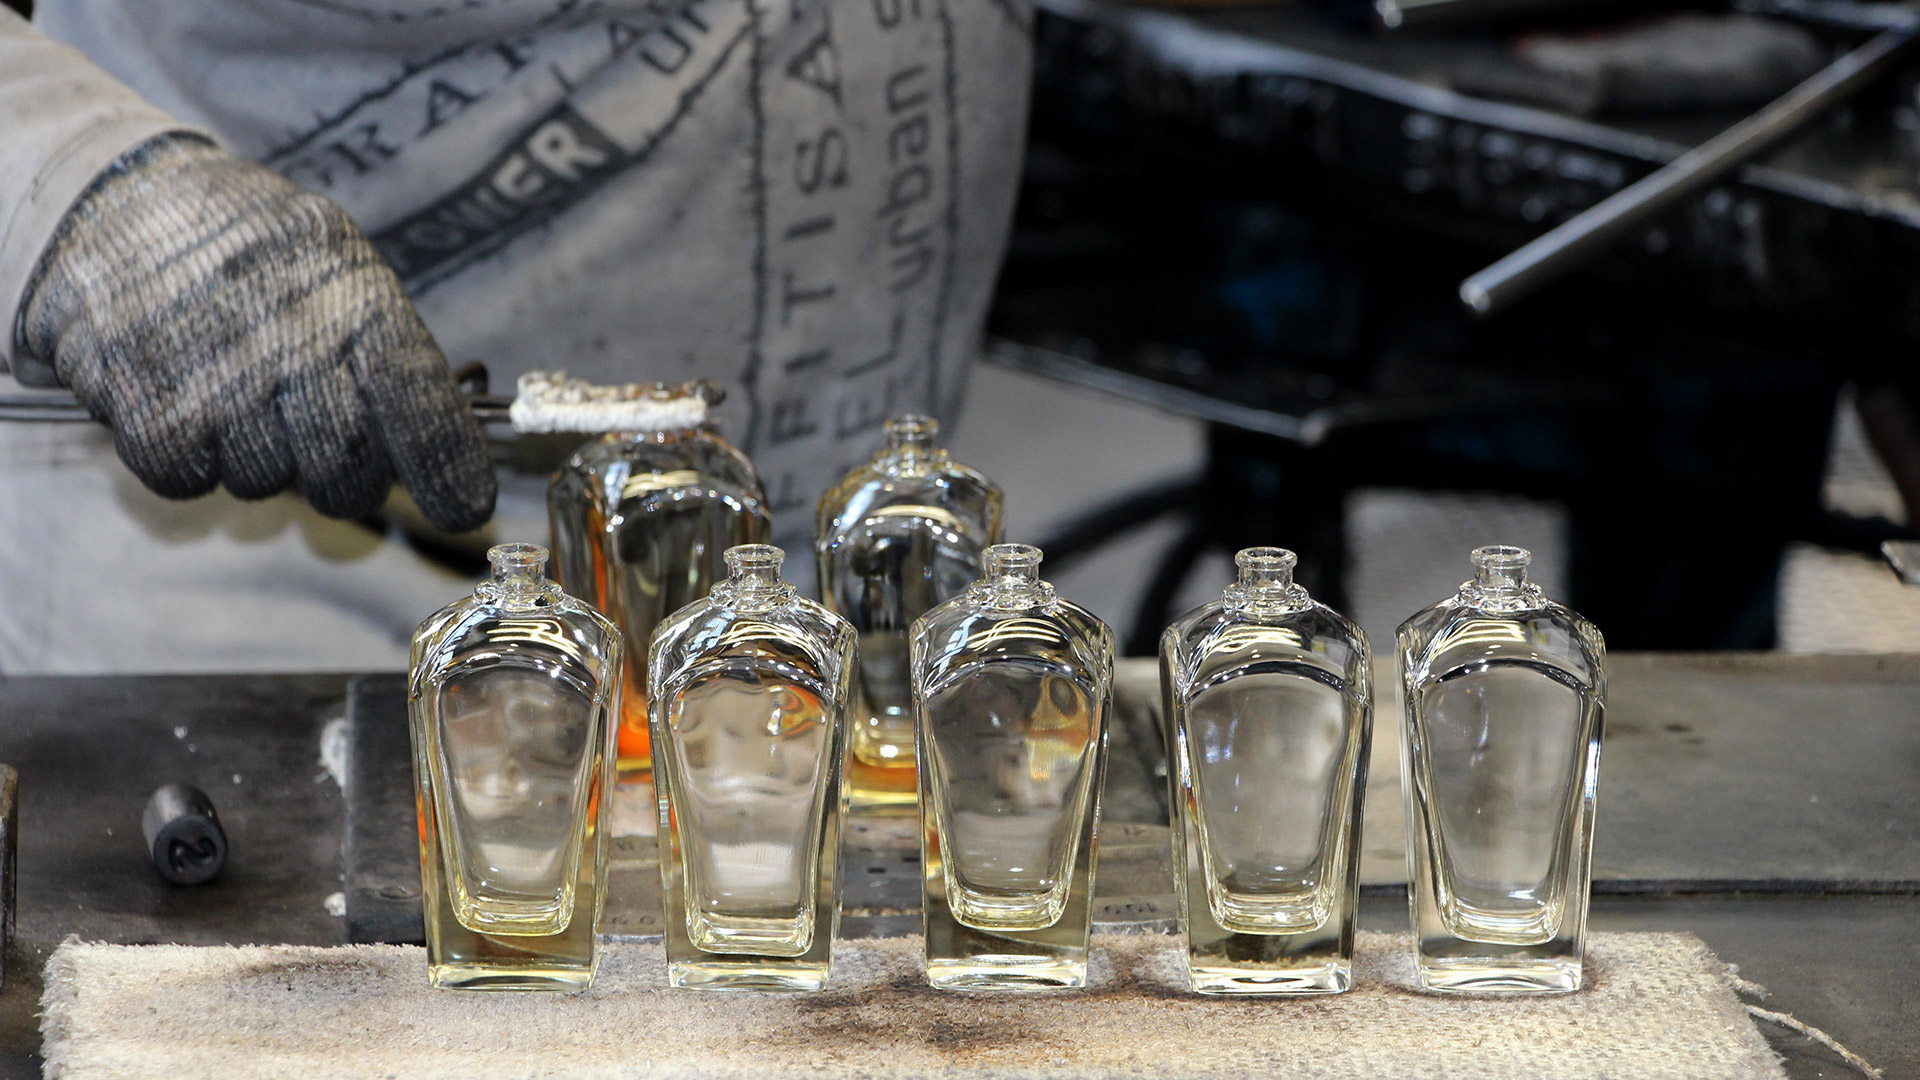 Savoir Godet Godet Parfums Faire Savoir Parfums Savoir Faire mOv8wNn0